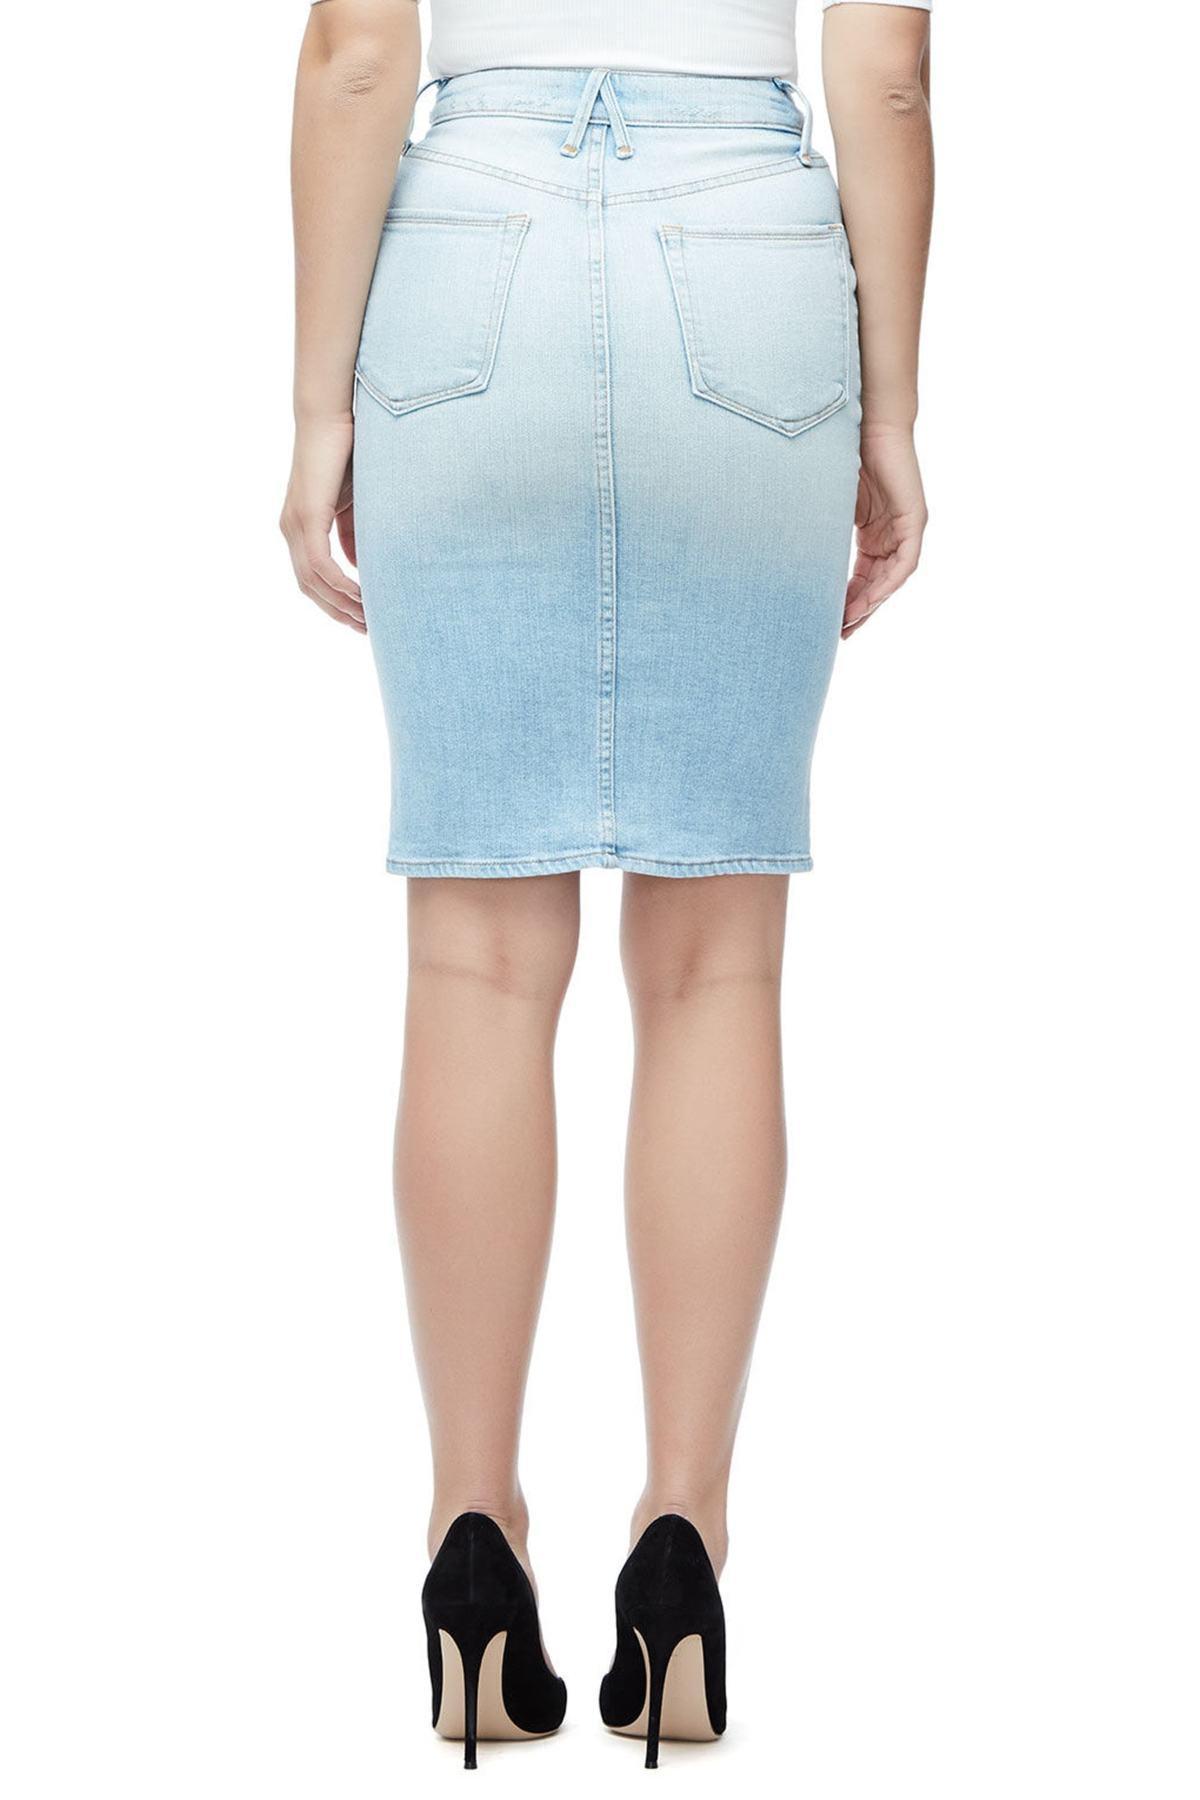 071d2a1967422 Lyst - Good American The Pencil Skirt (blue 146) (regular   Plus ...